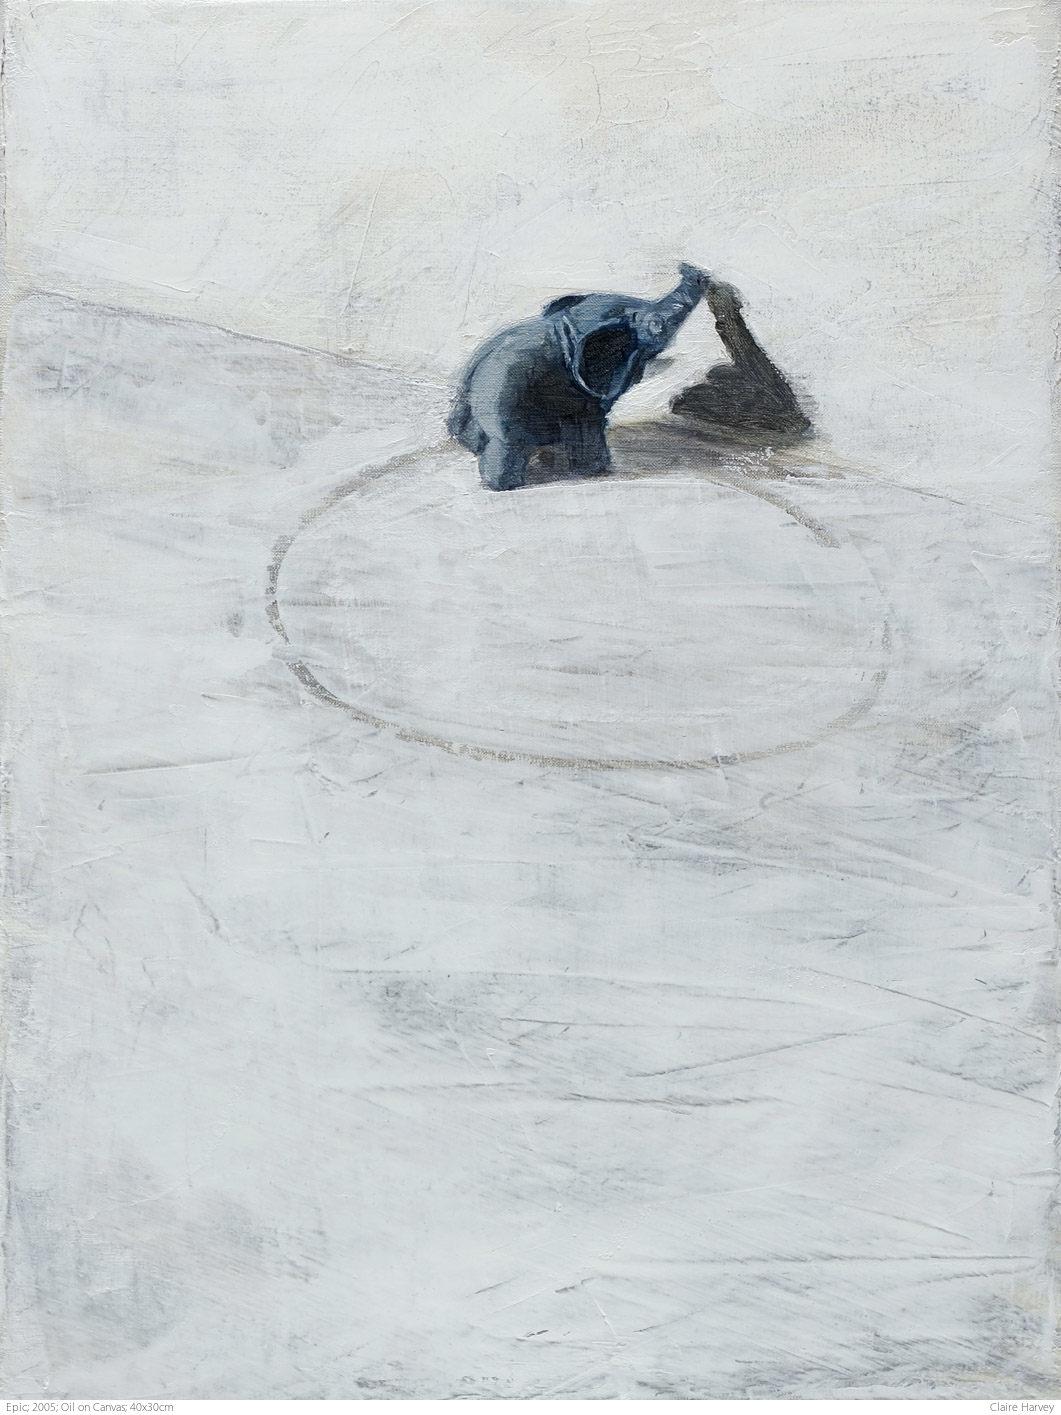 Epic; 2005; Oil on Canvas; 40x30cm